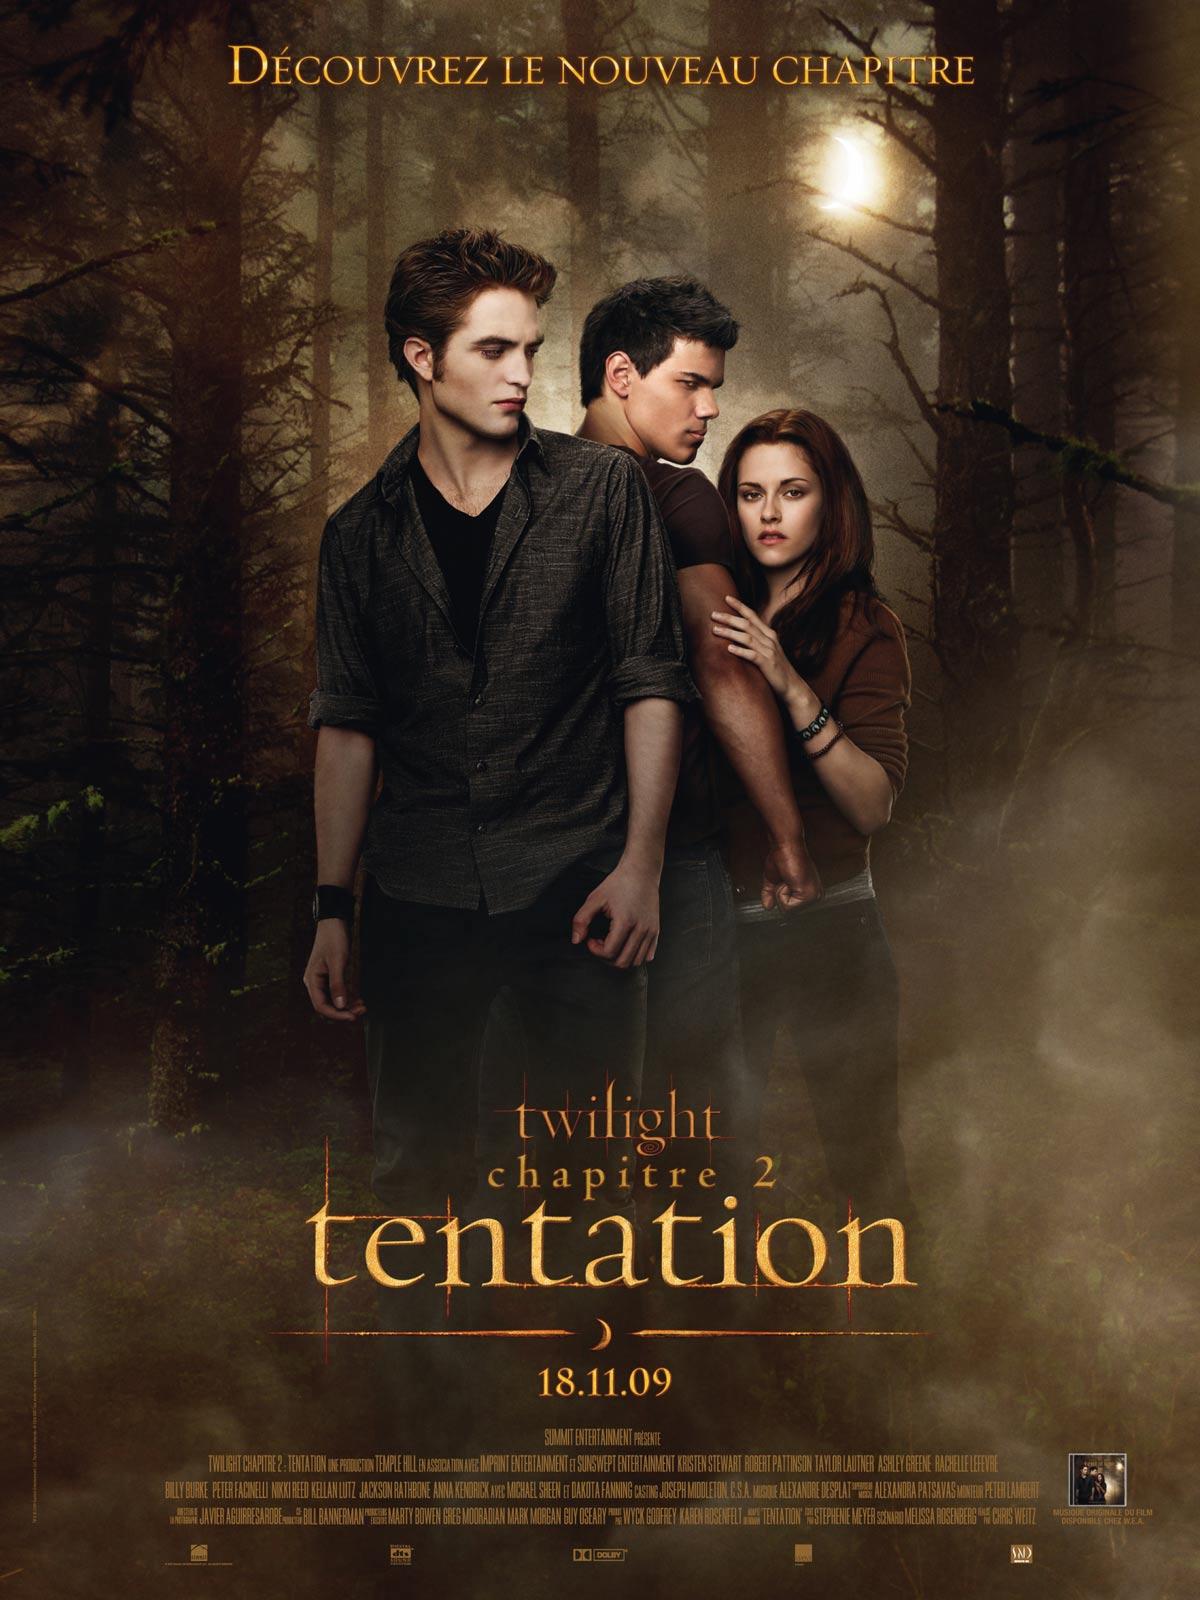 Twilight - Chapitre 2 : tentation streaming